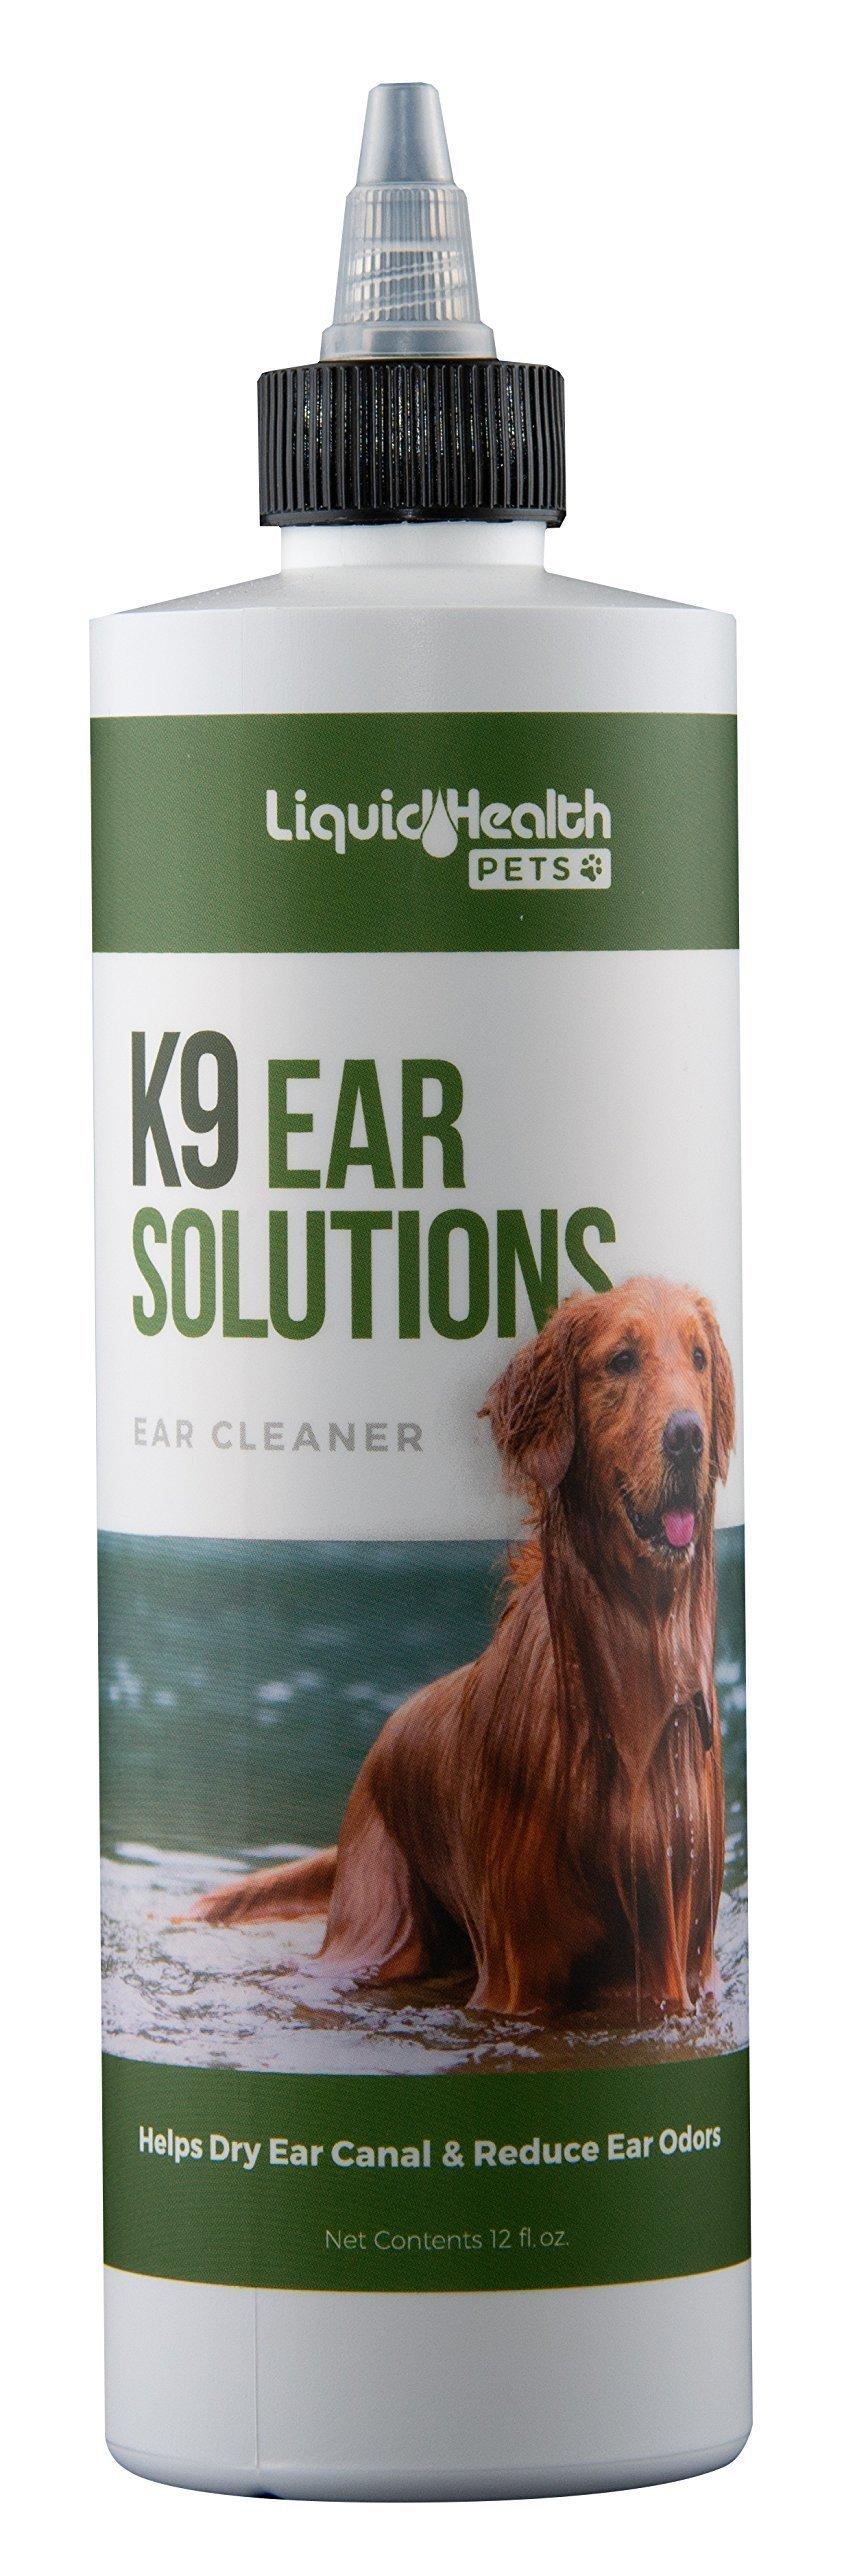 Liquid Health For Animals K9 Ear Solutions 12 oz Liquid by Liquid Health (Image #1)